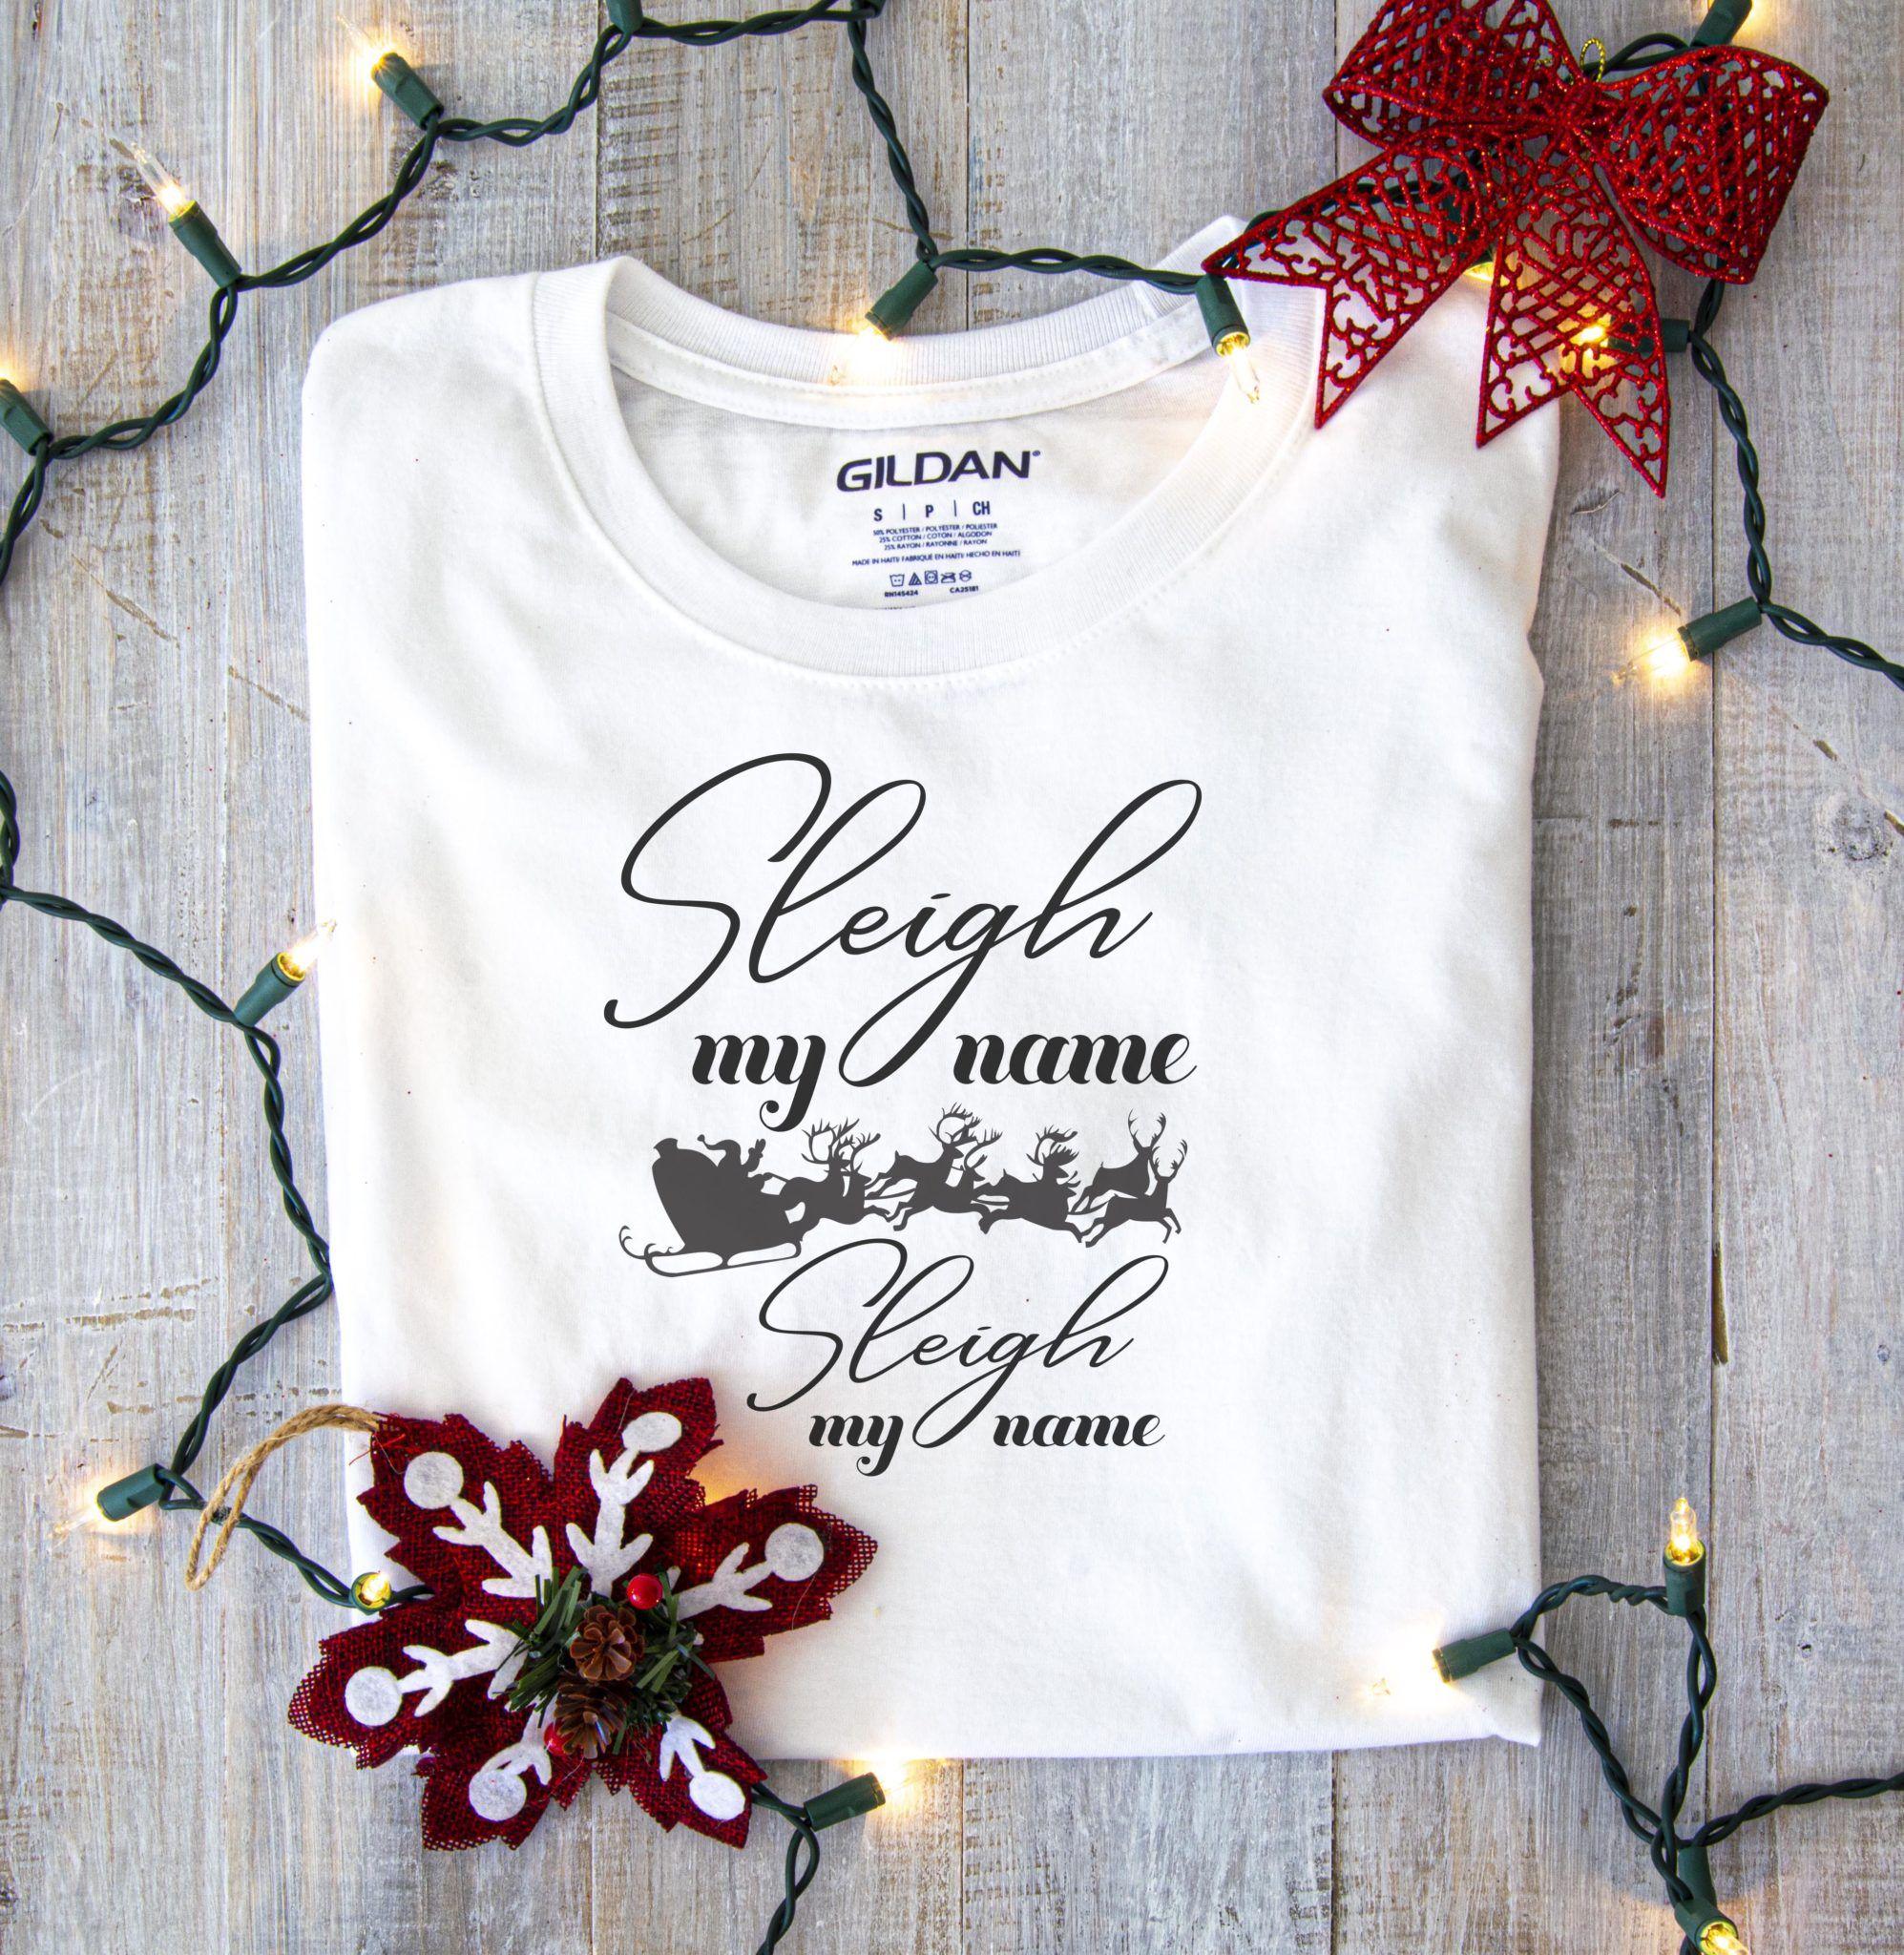 Free Sleigh My Name SVG File Shirt mockup, Clothing mockup